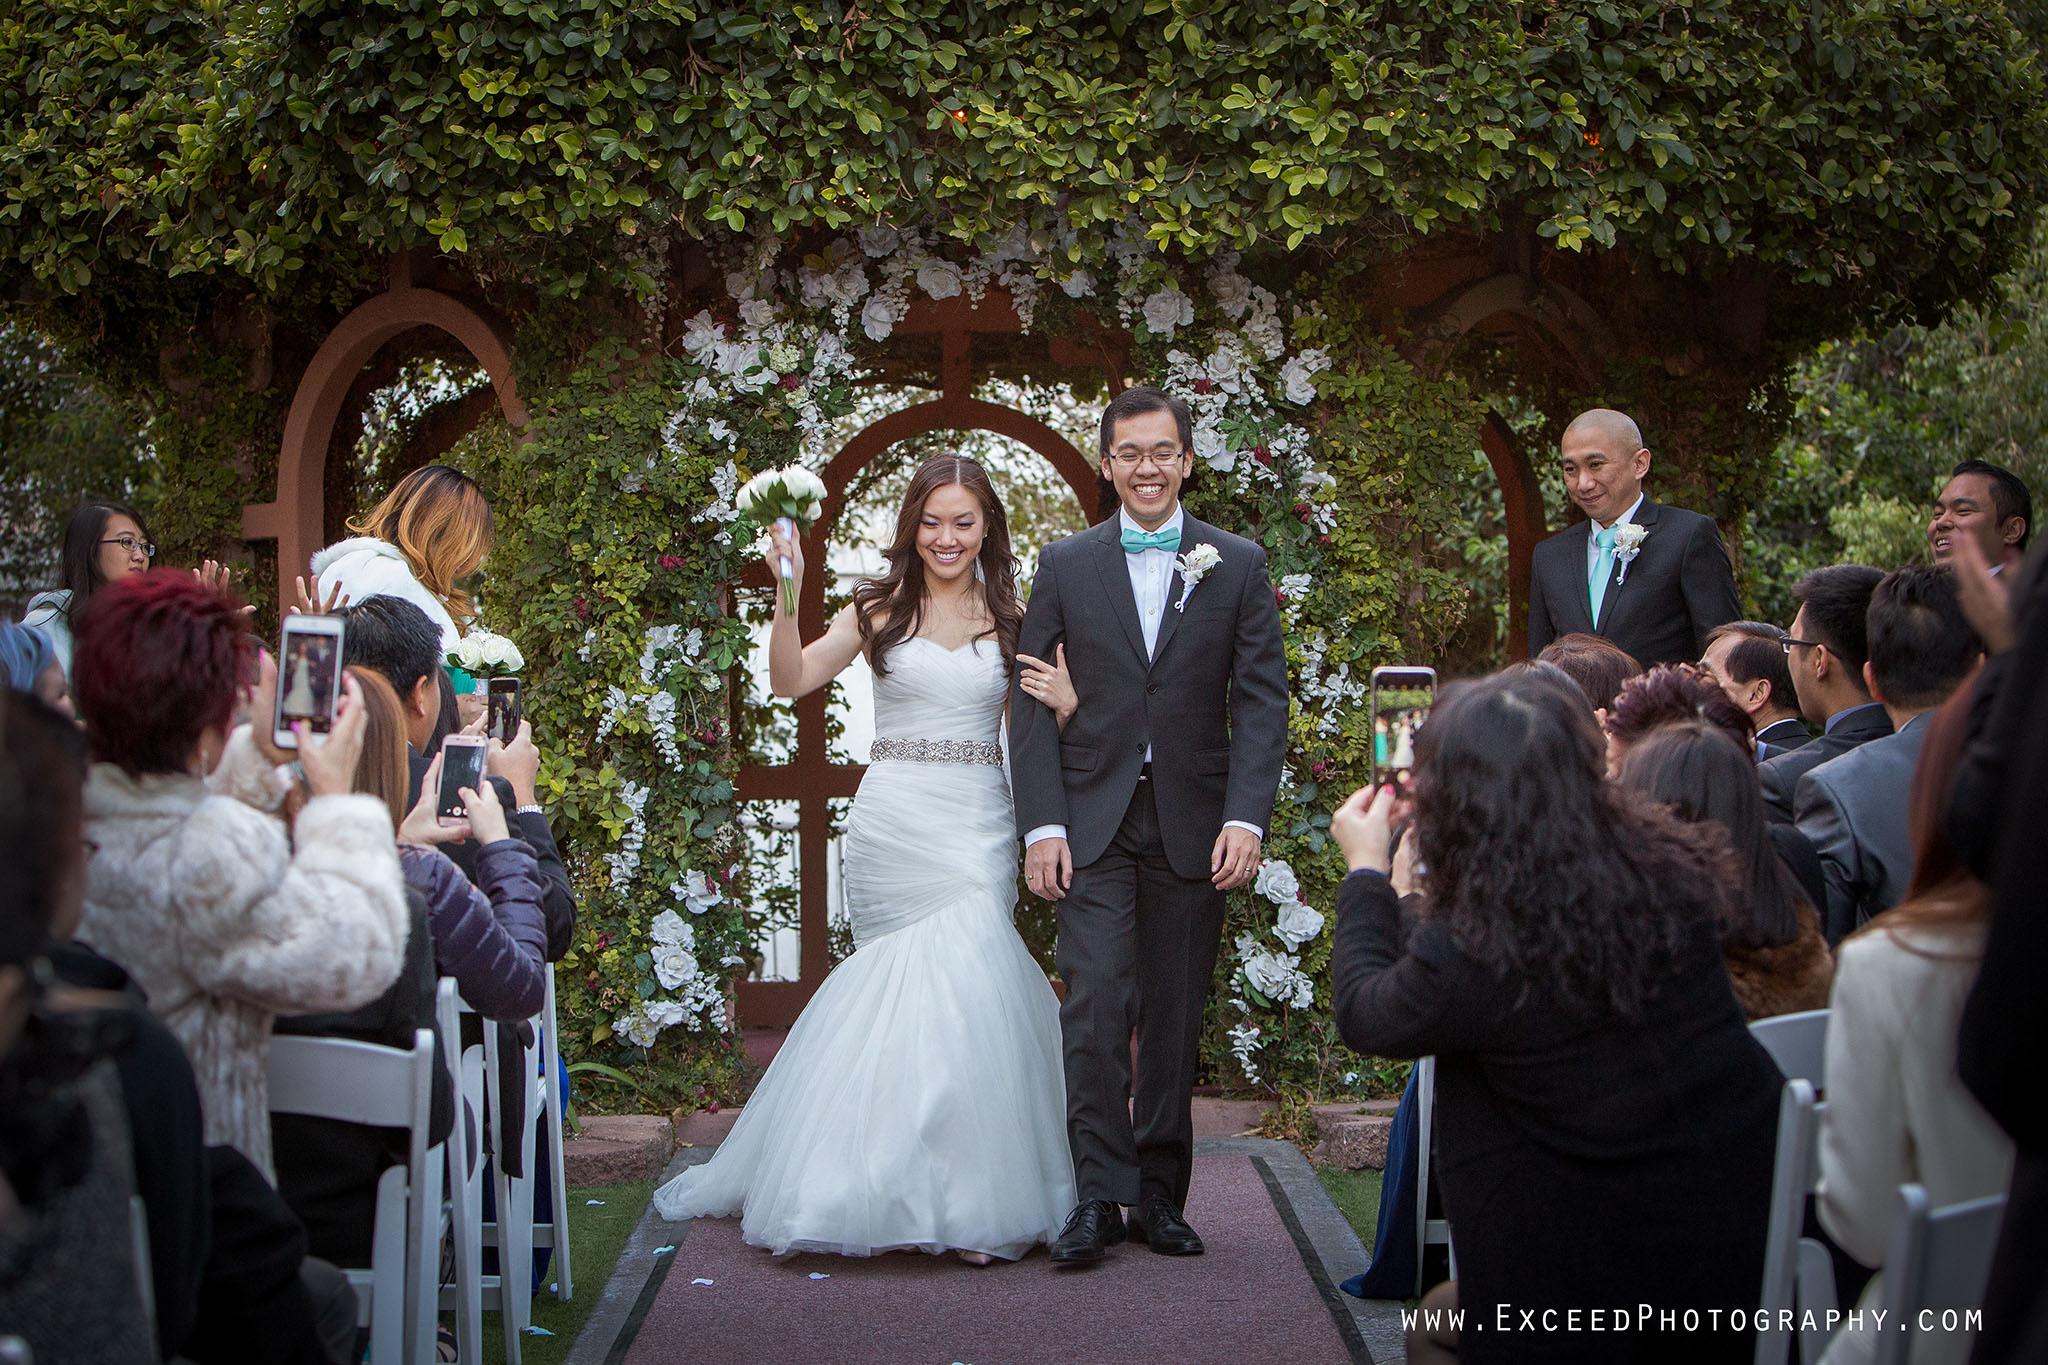 Flamingo Wedding Ceremony And The Reception At Sparklings Las Vegas